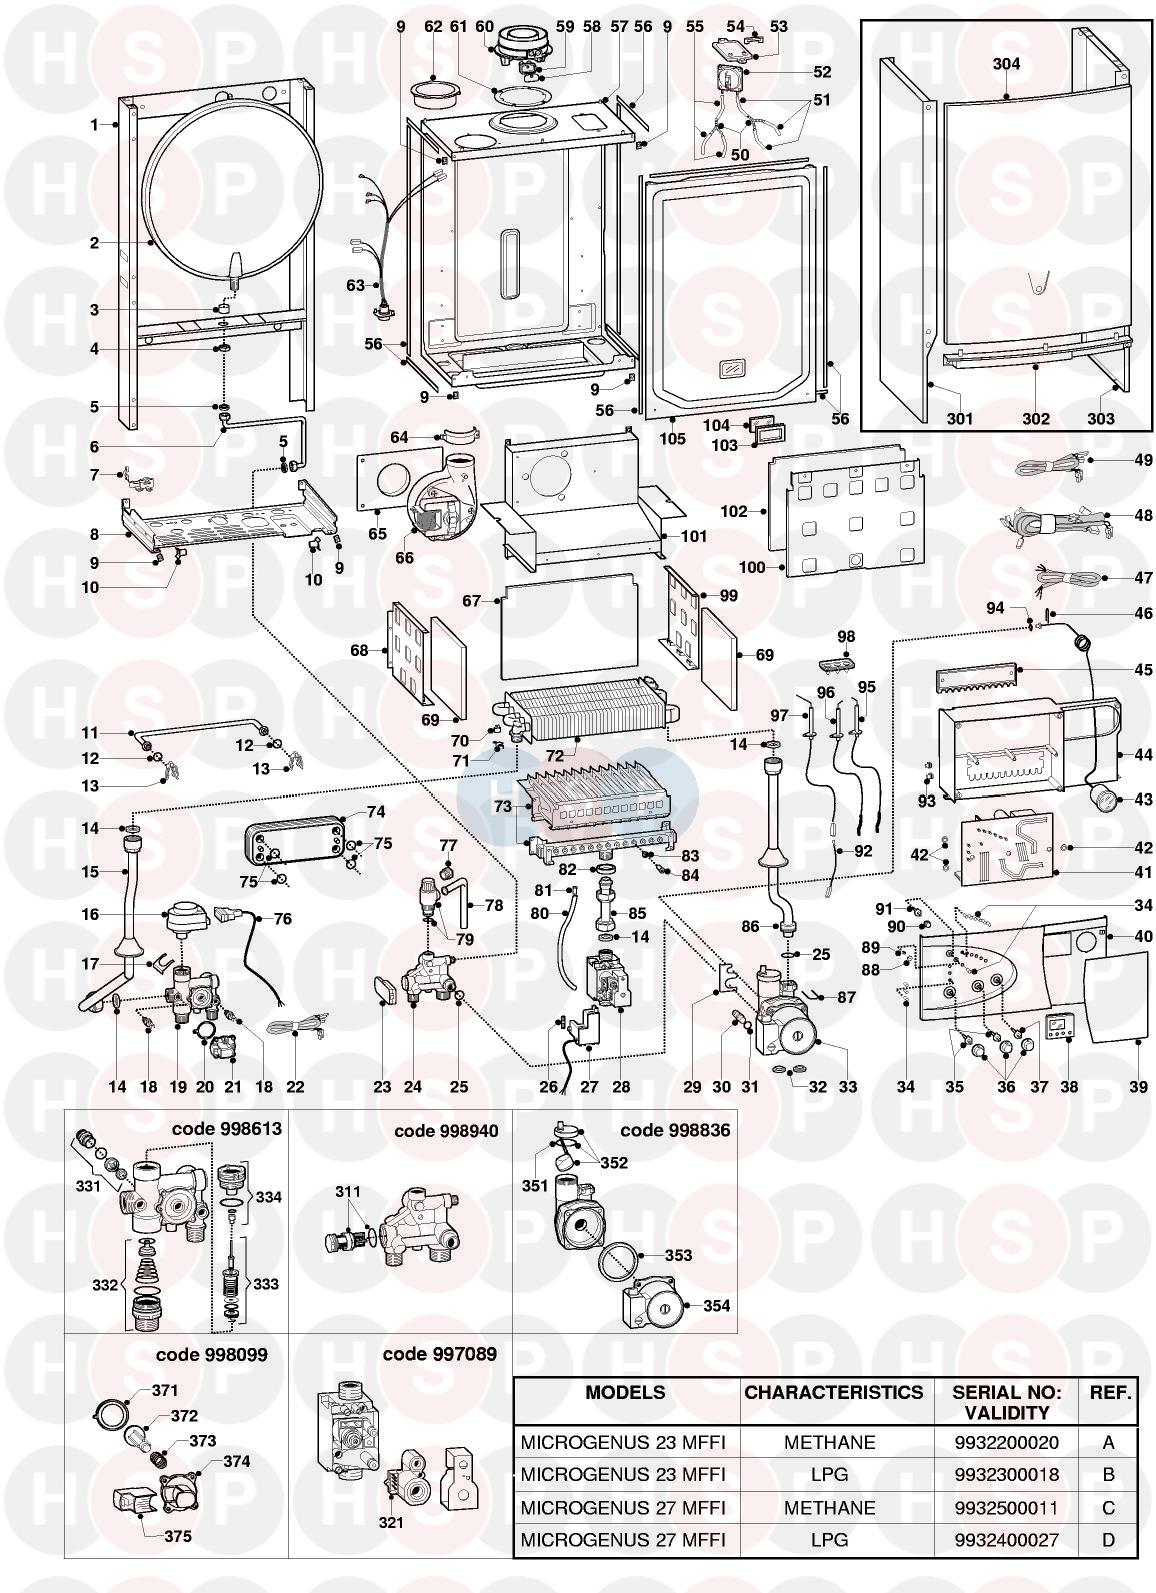 ariston microgenus 27 mffi edition1  exploded view  diagram